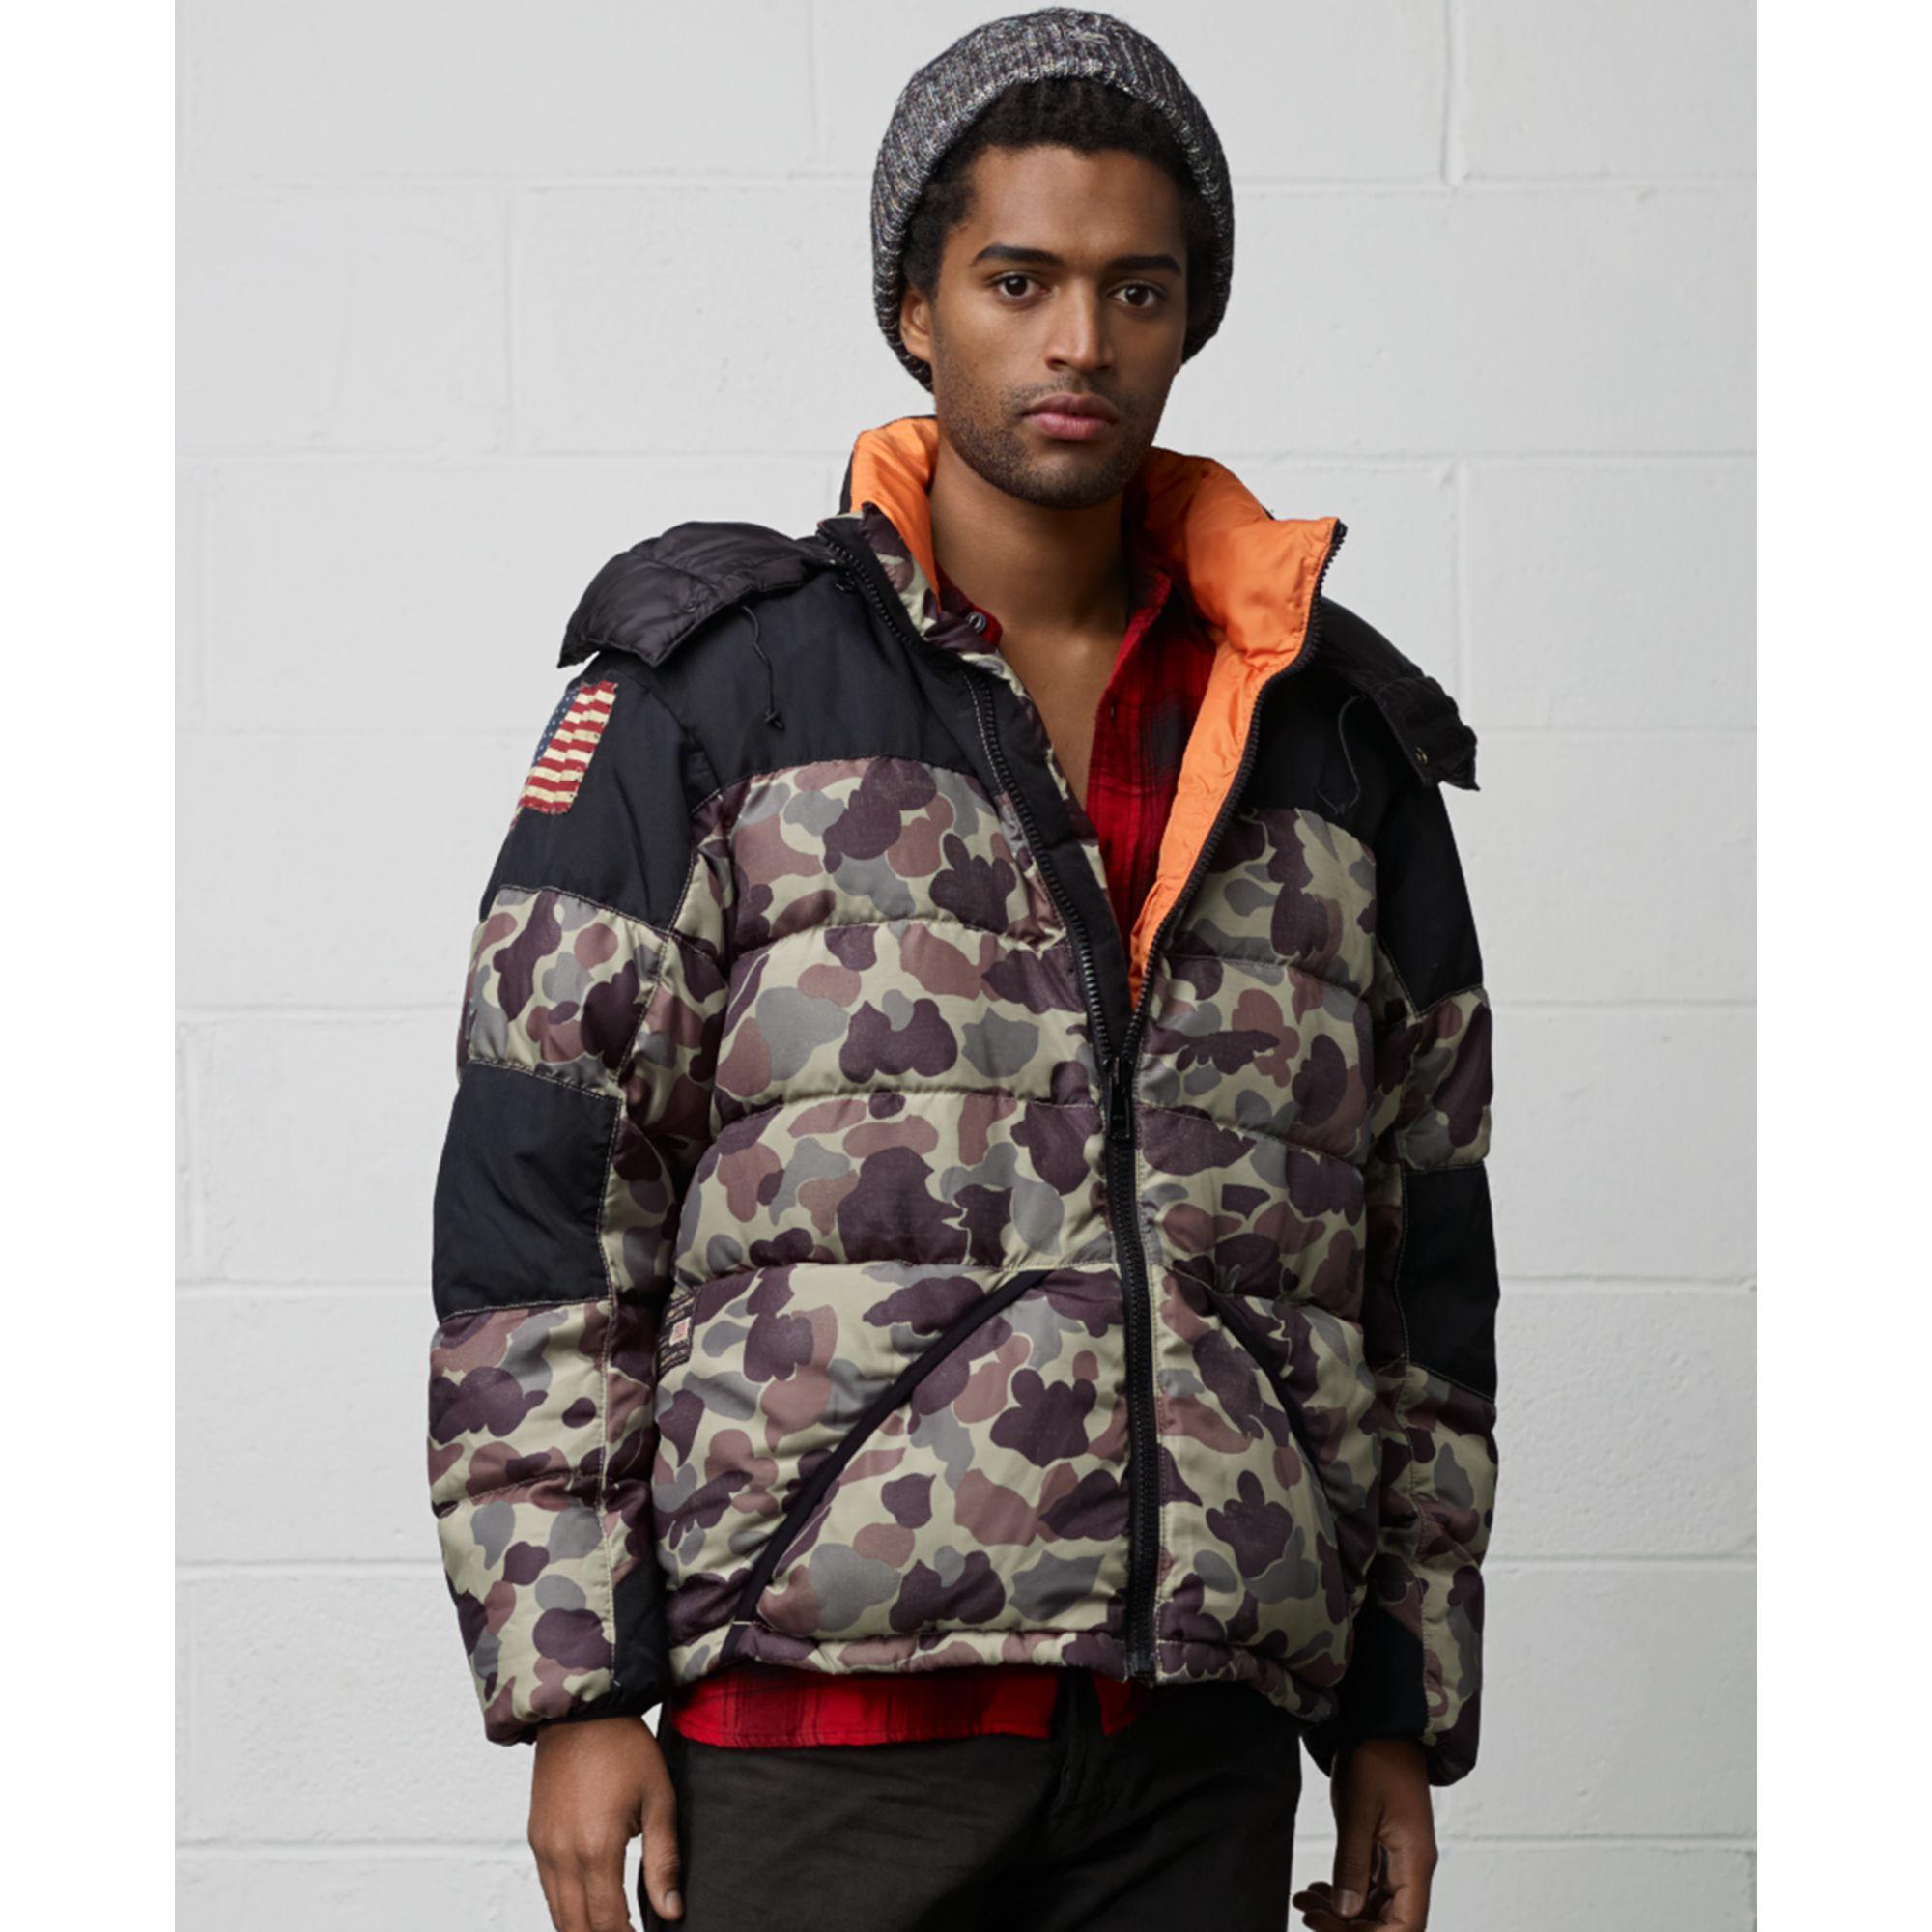 0cc5ab2c2a367 Denim & Supply Ralph Lauren Camo Expedition Down Jacket for Men - Lyst